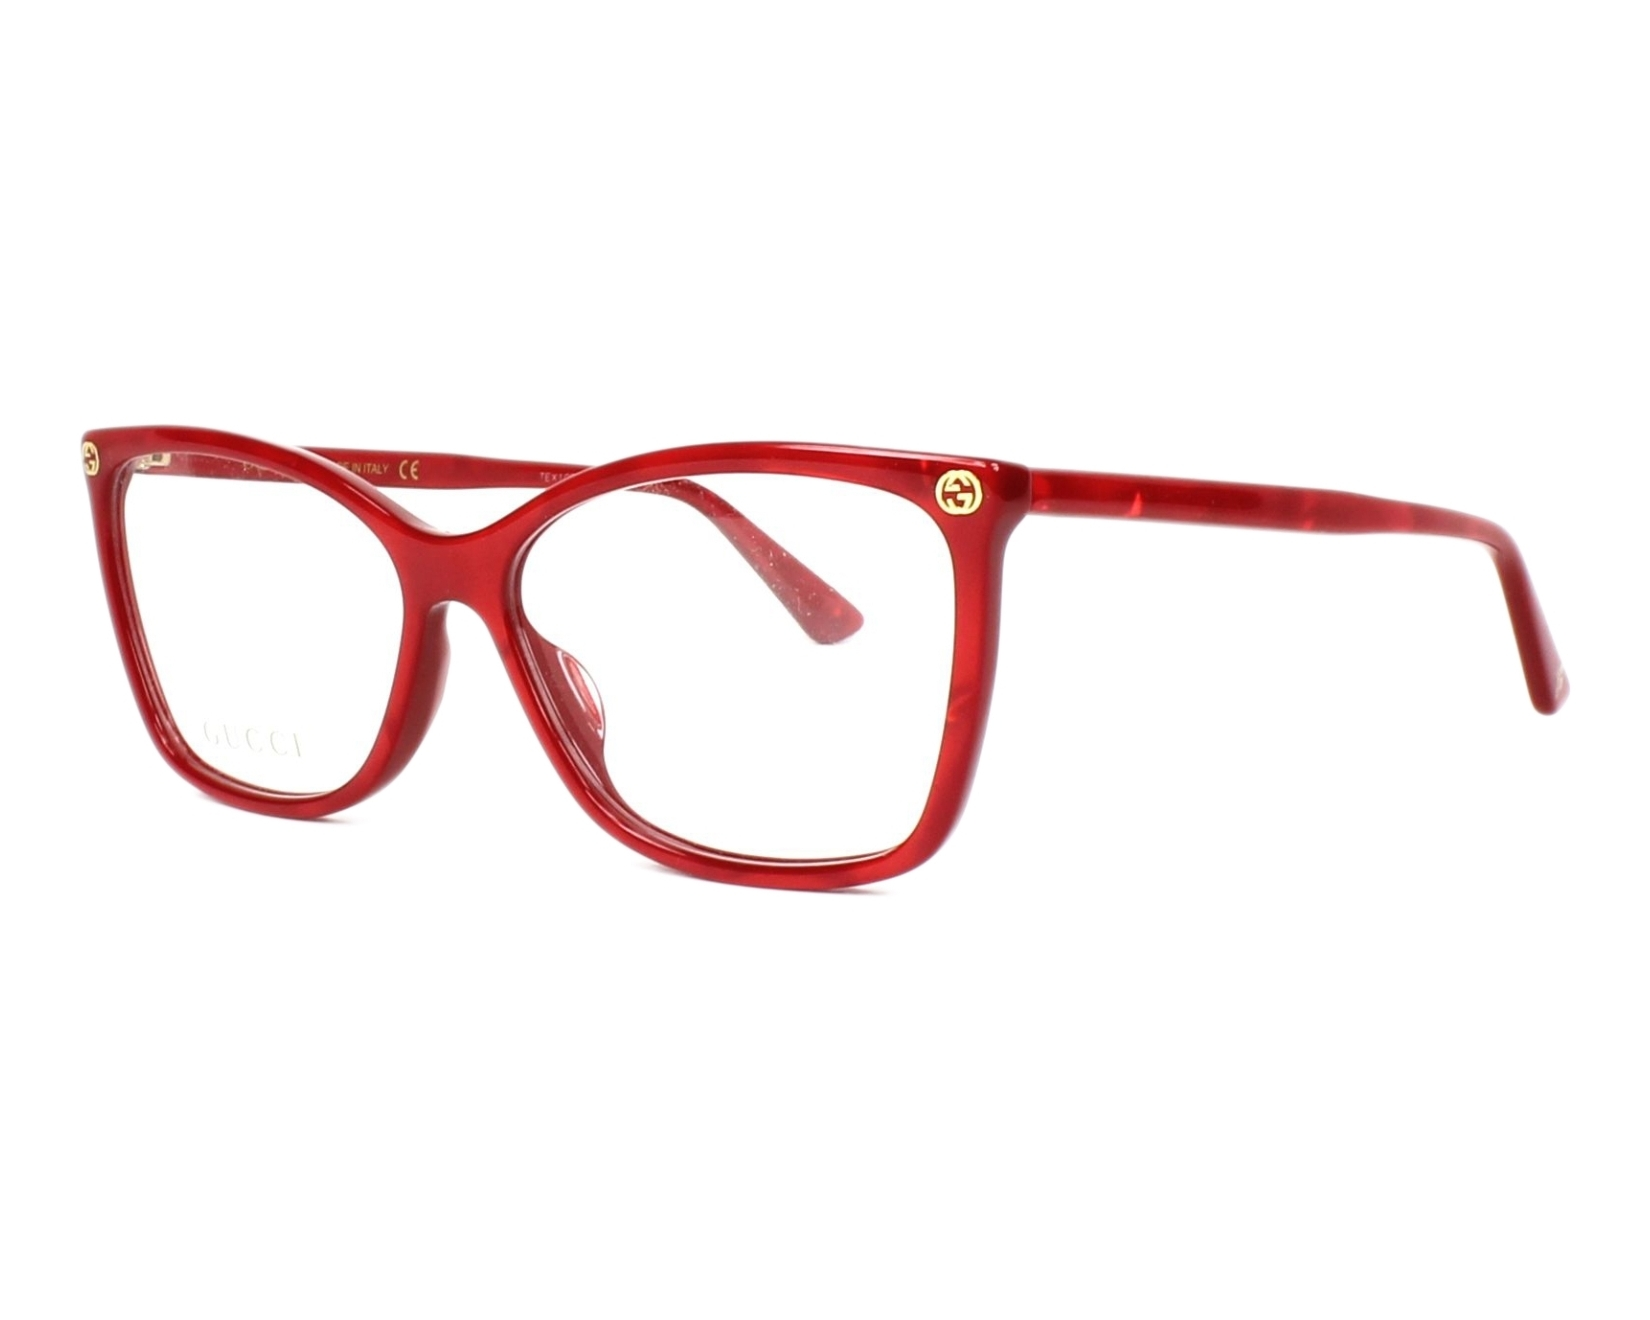 Buy Gucci Eyeglasses GG-00250 004 Online - Visionet